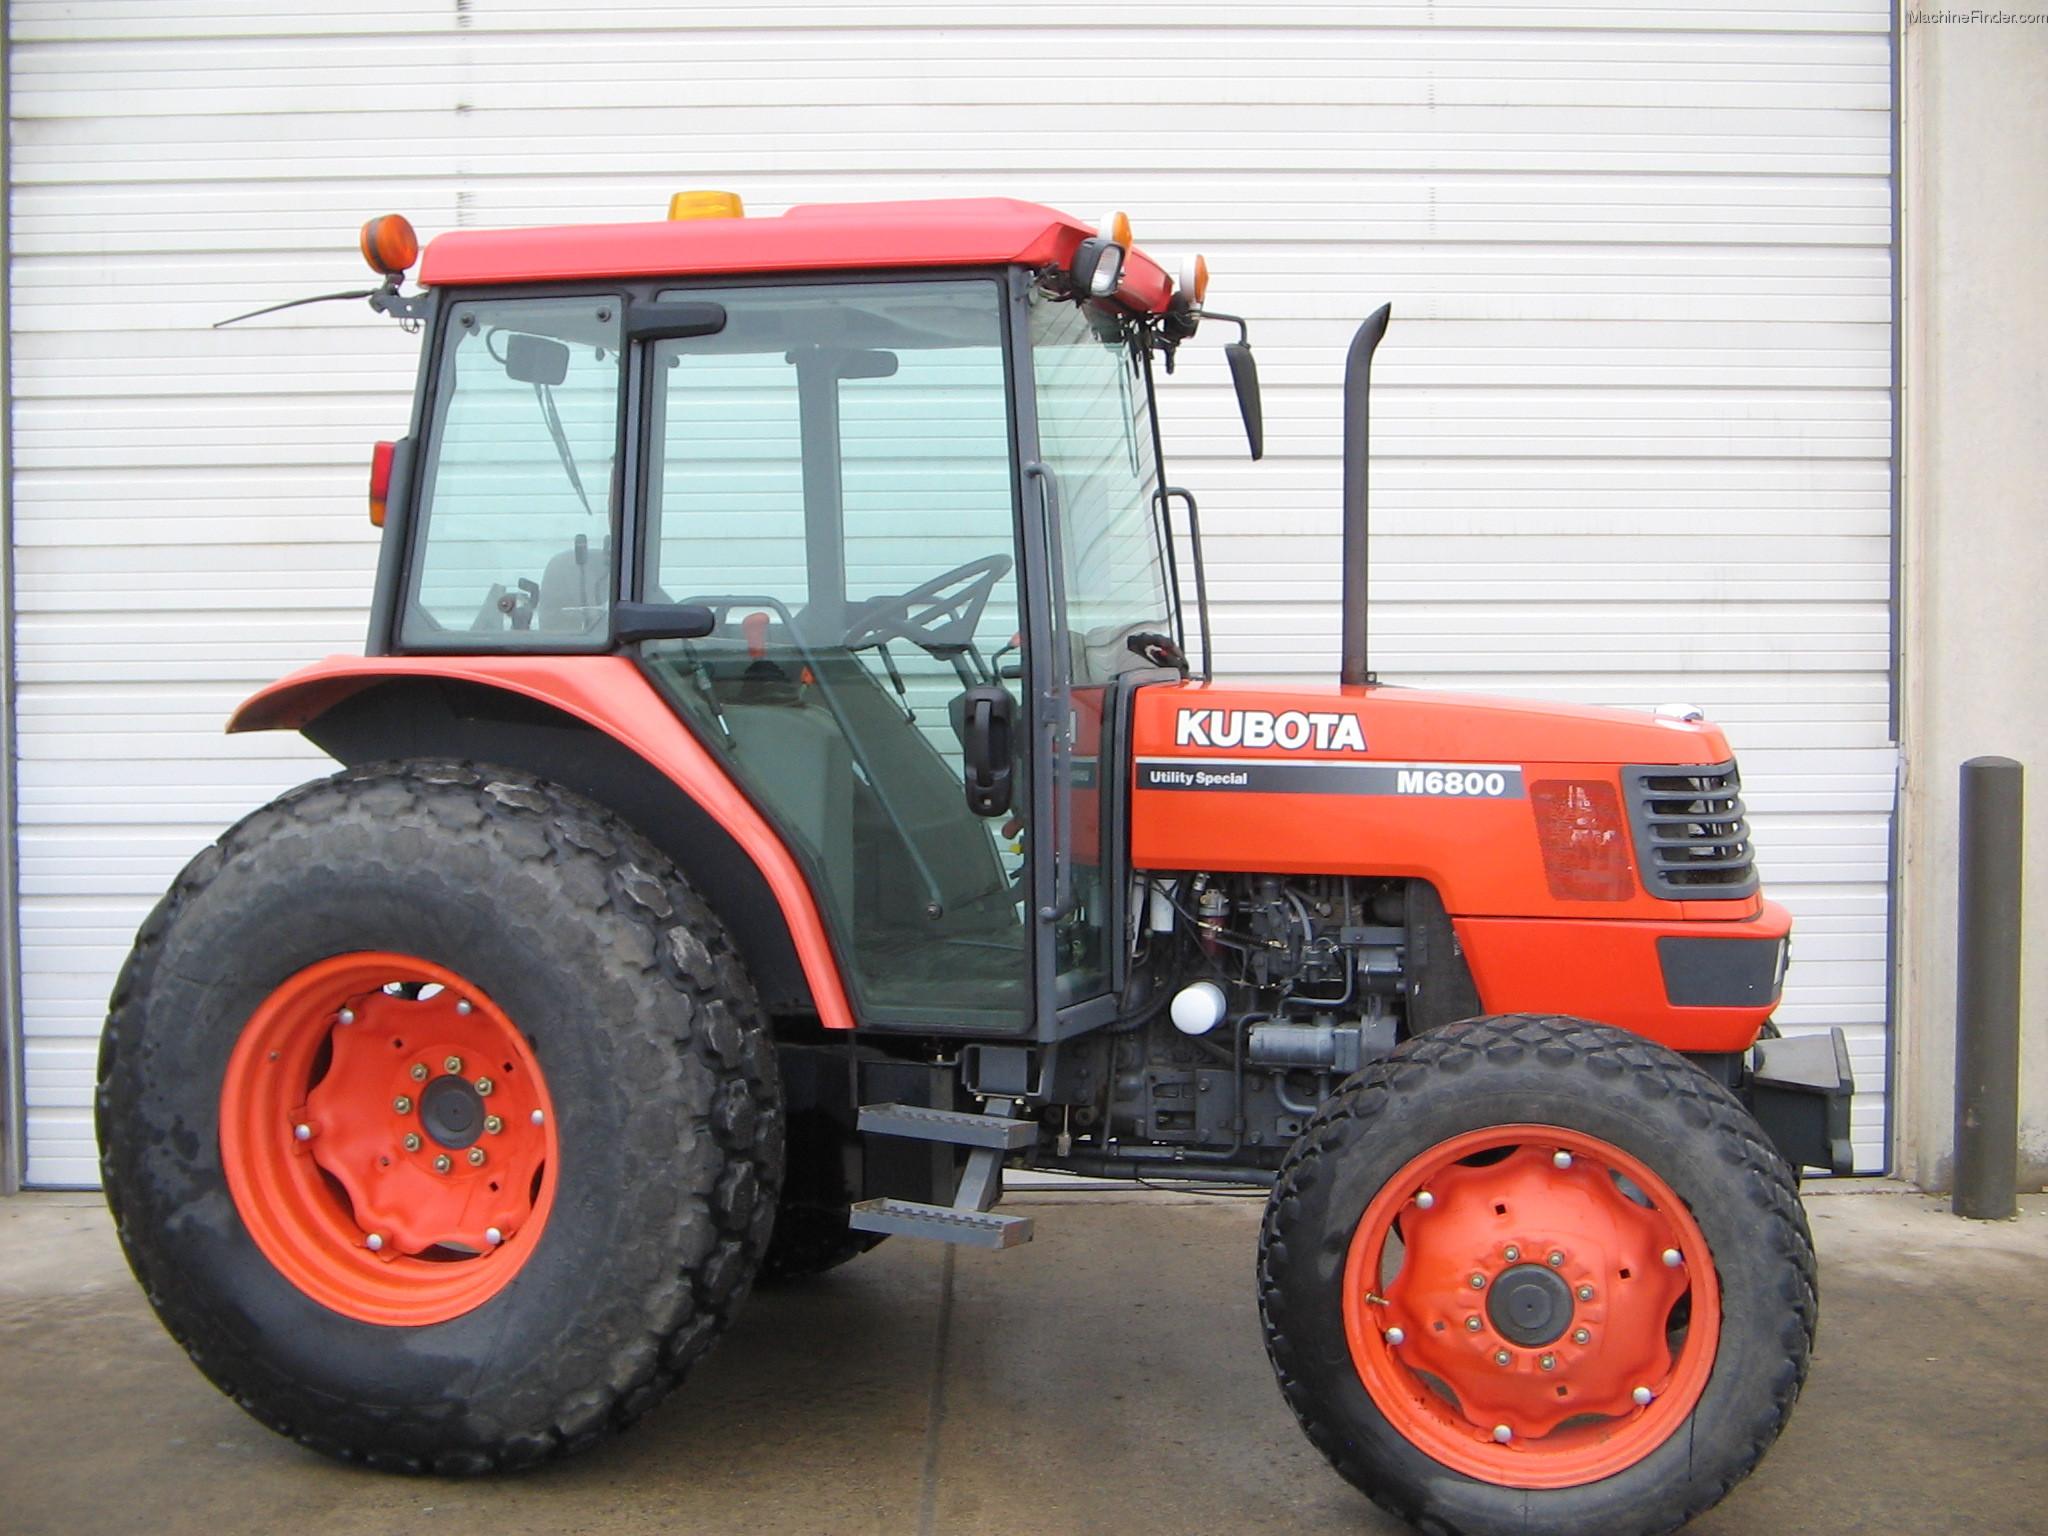 Kubota M6800 Farm Tractor Tractors M9540 Wiring Diagram